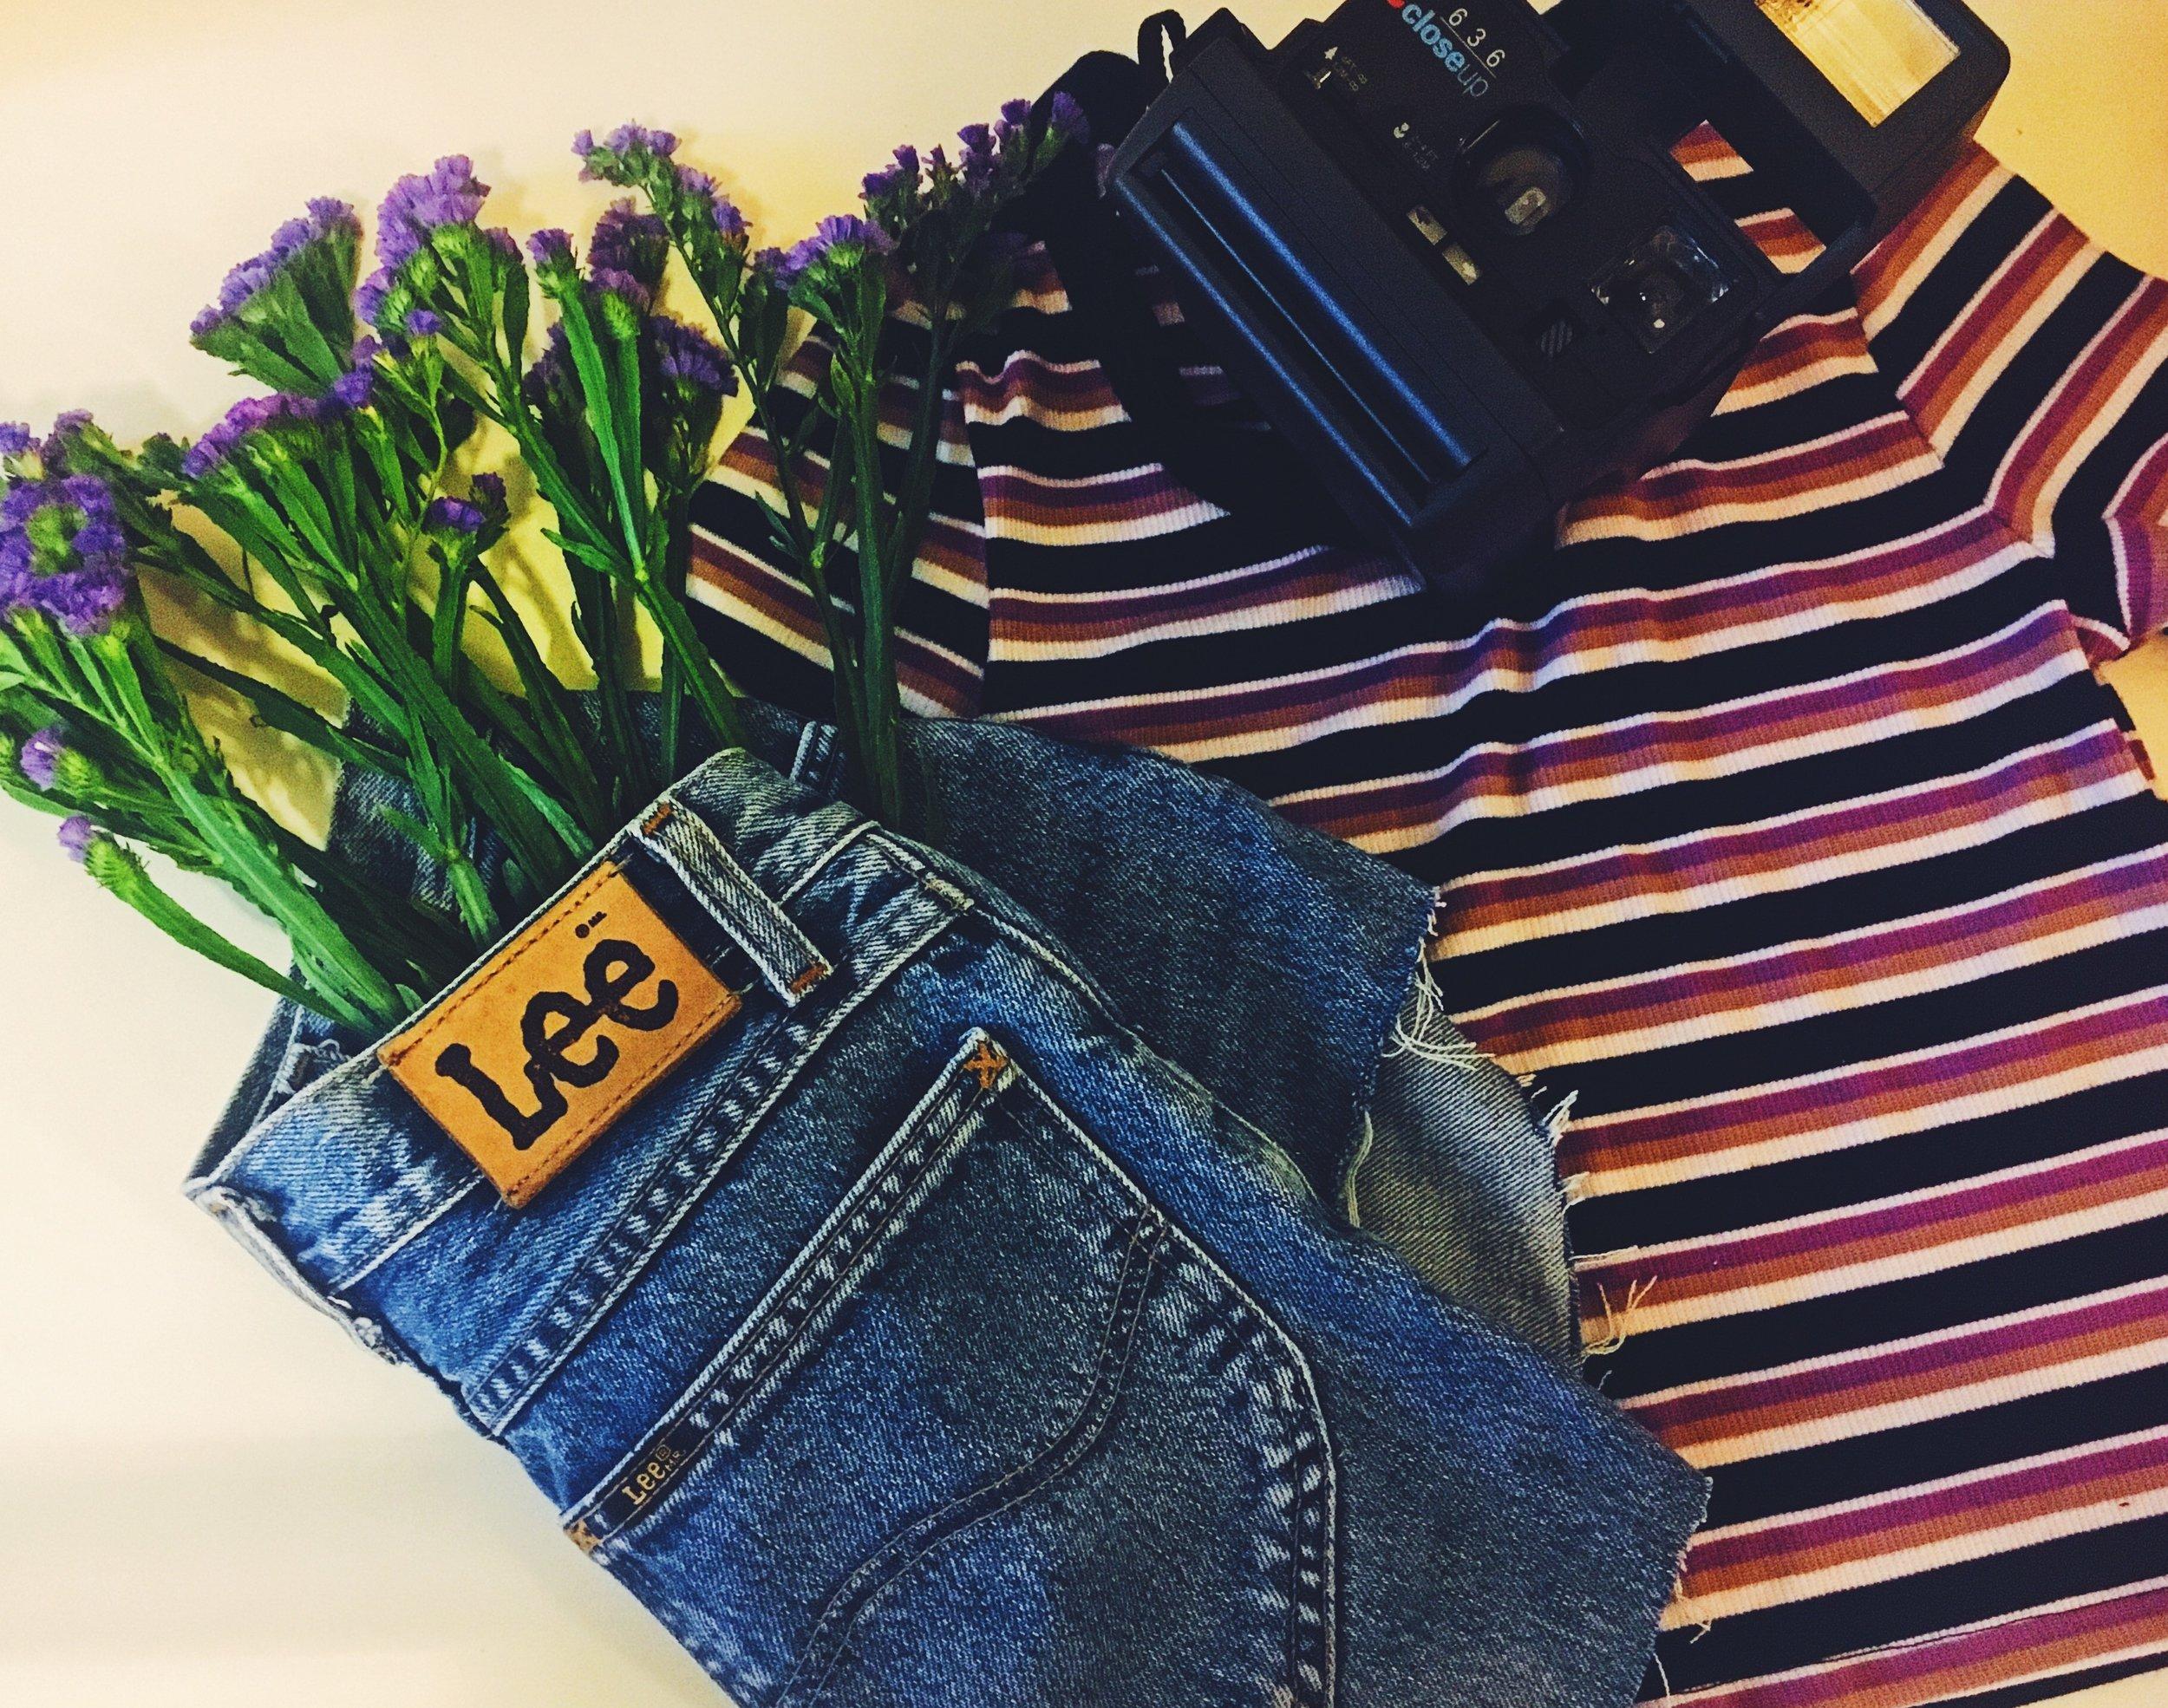 Retroshoot - #Lee jeans + Polaroid = never enoughWeekend vibes